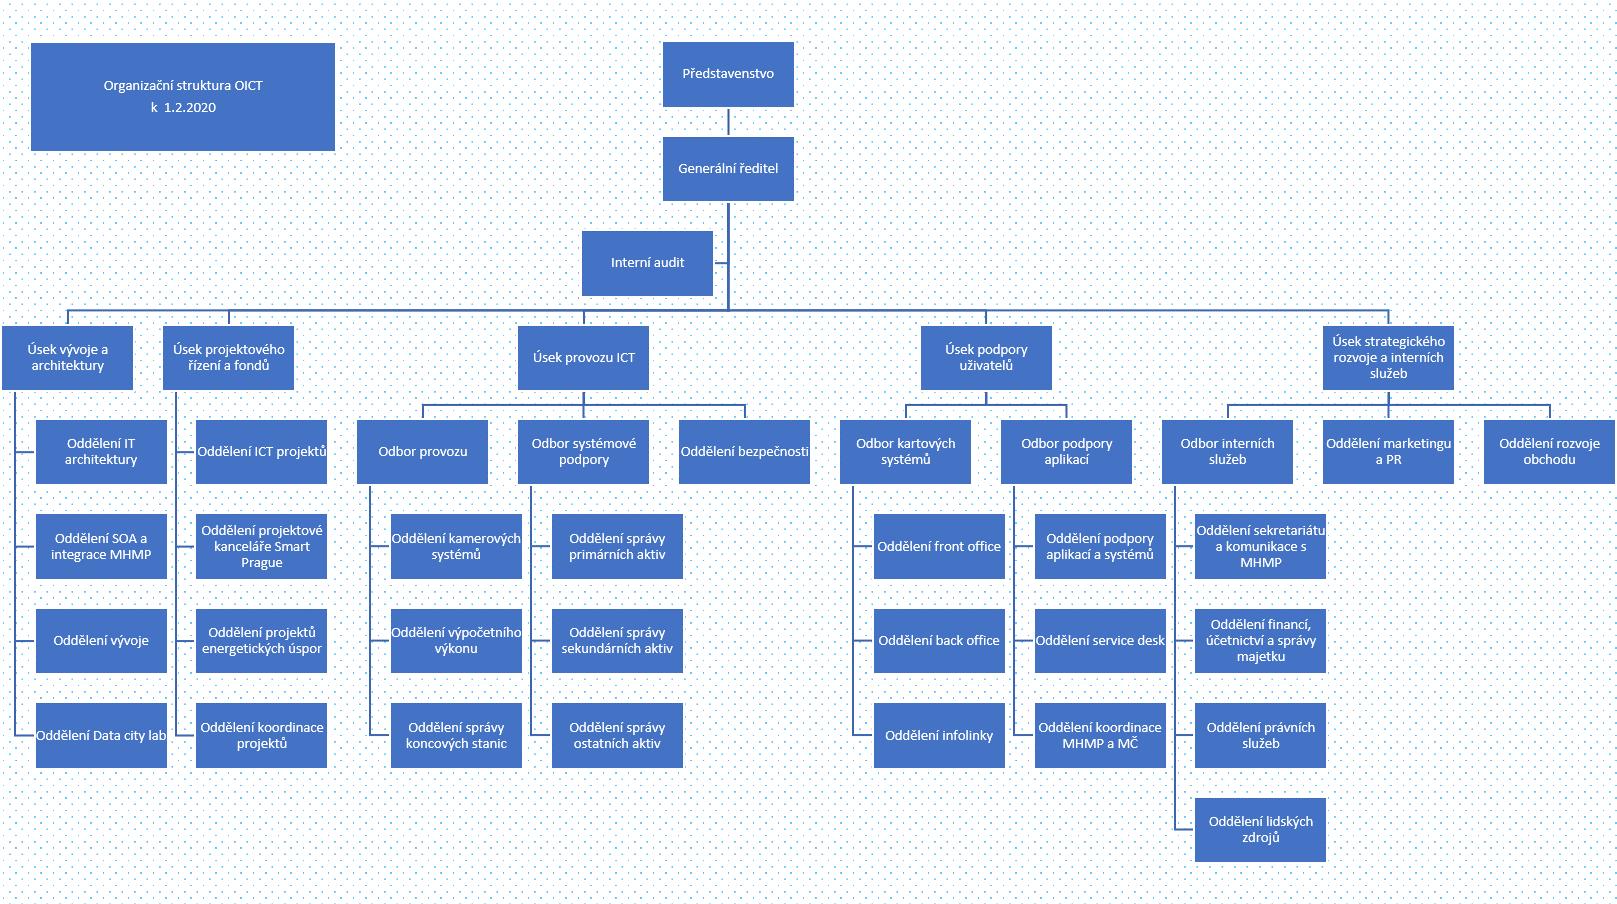 org-struktura-02_2020-bez-jmen